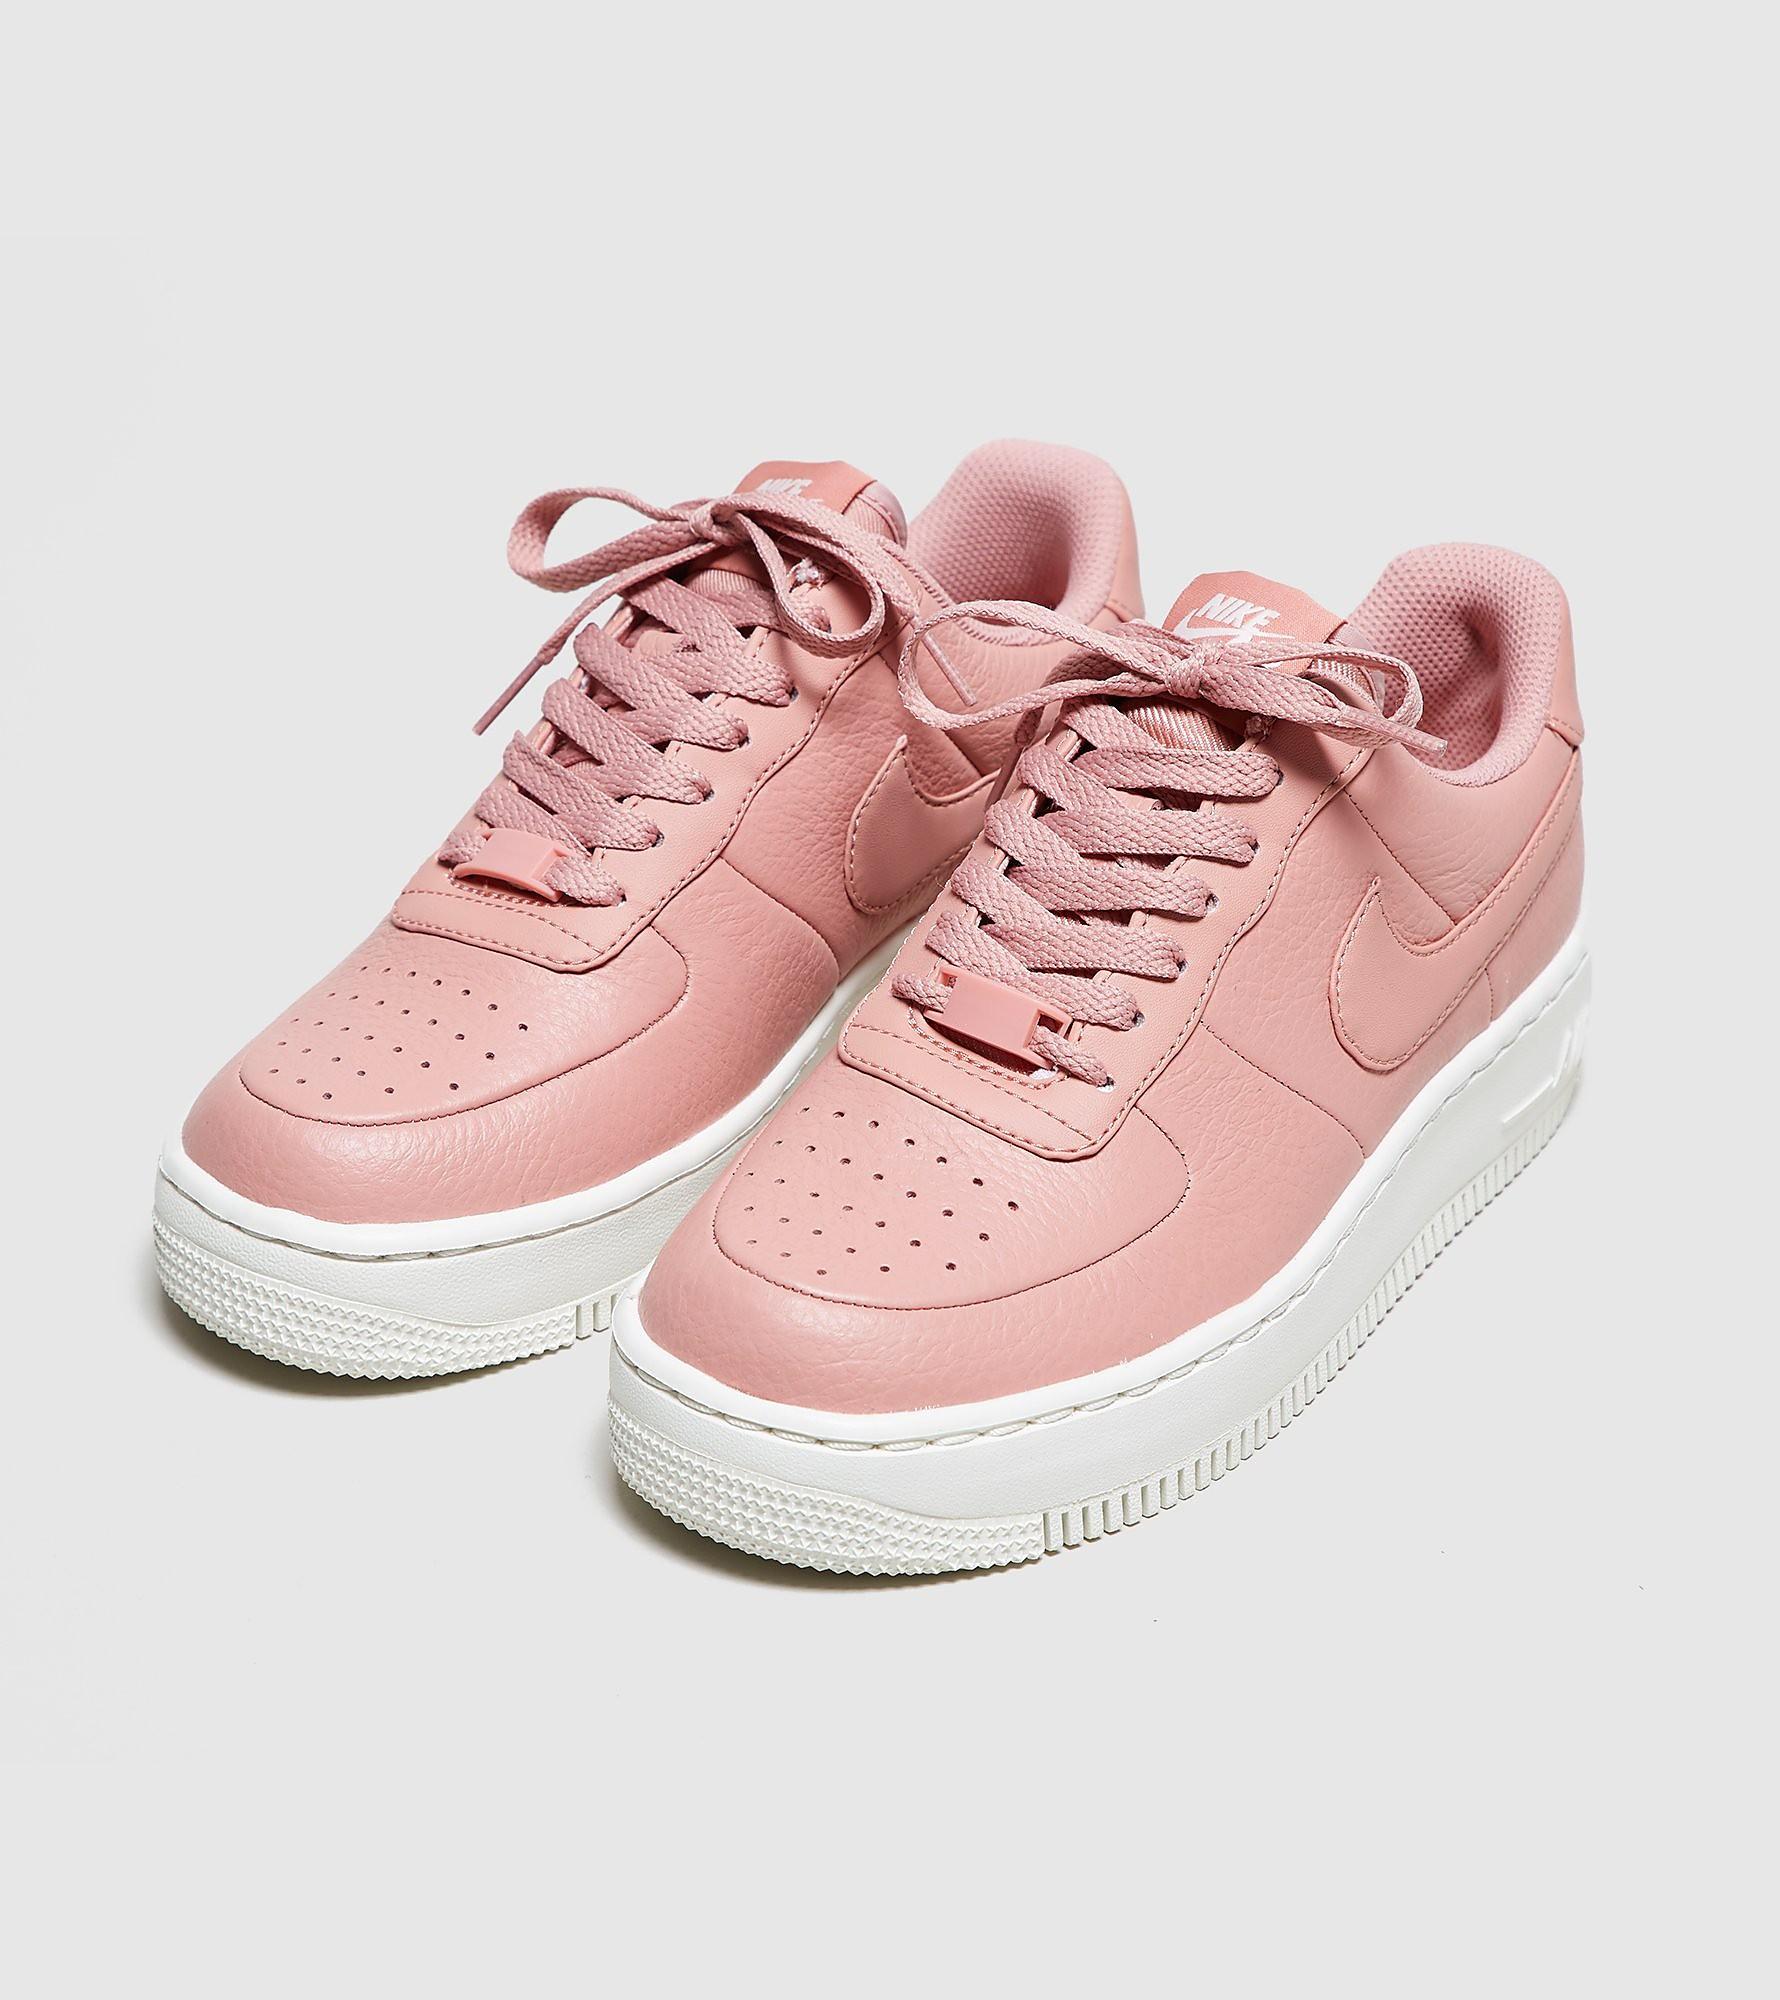 Nike Air Force 1 Upstep Women's